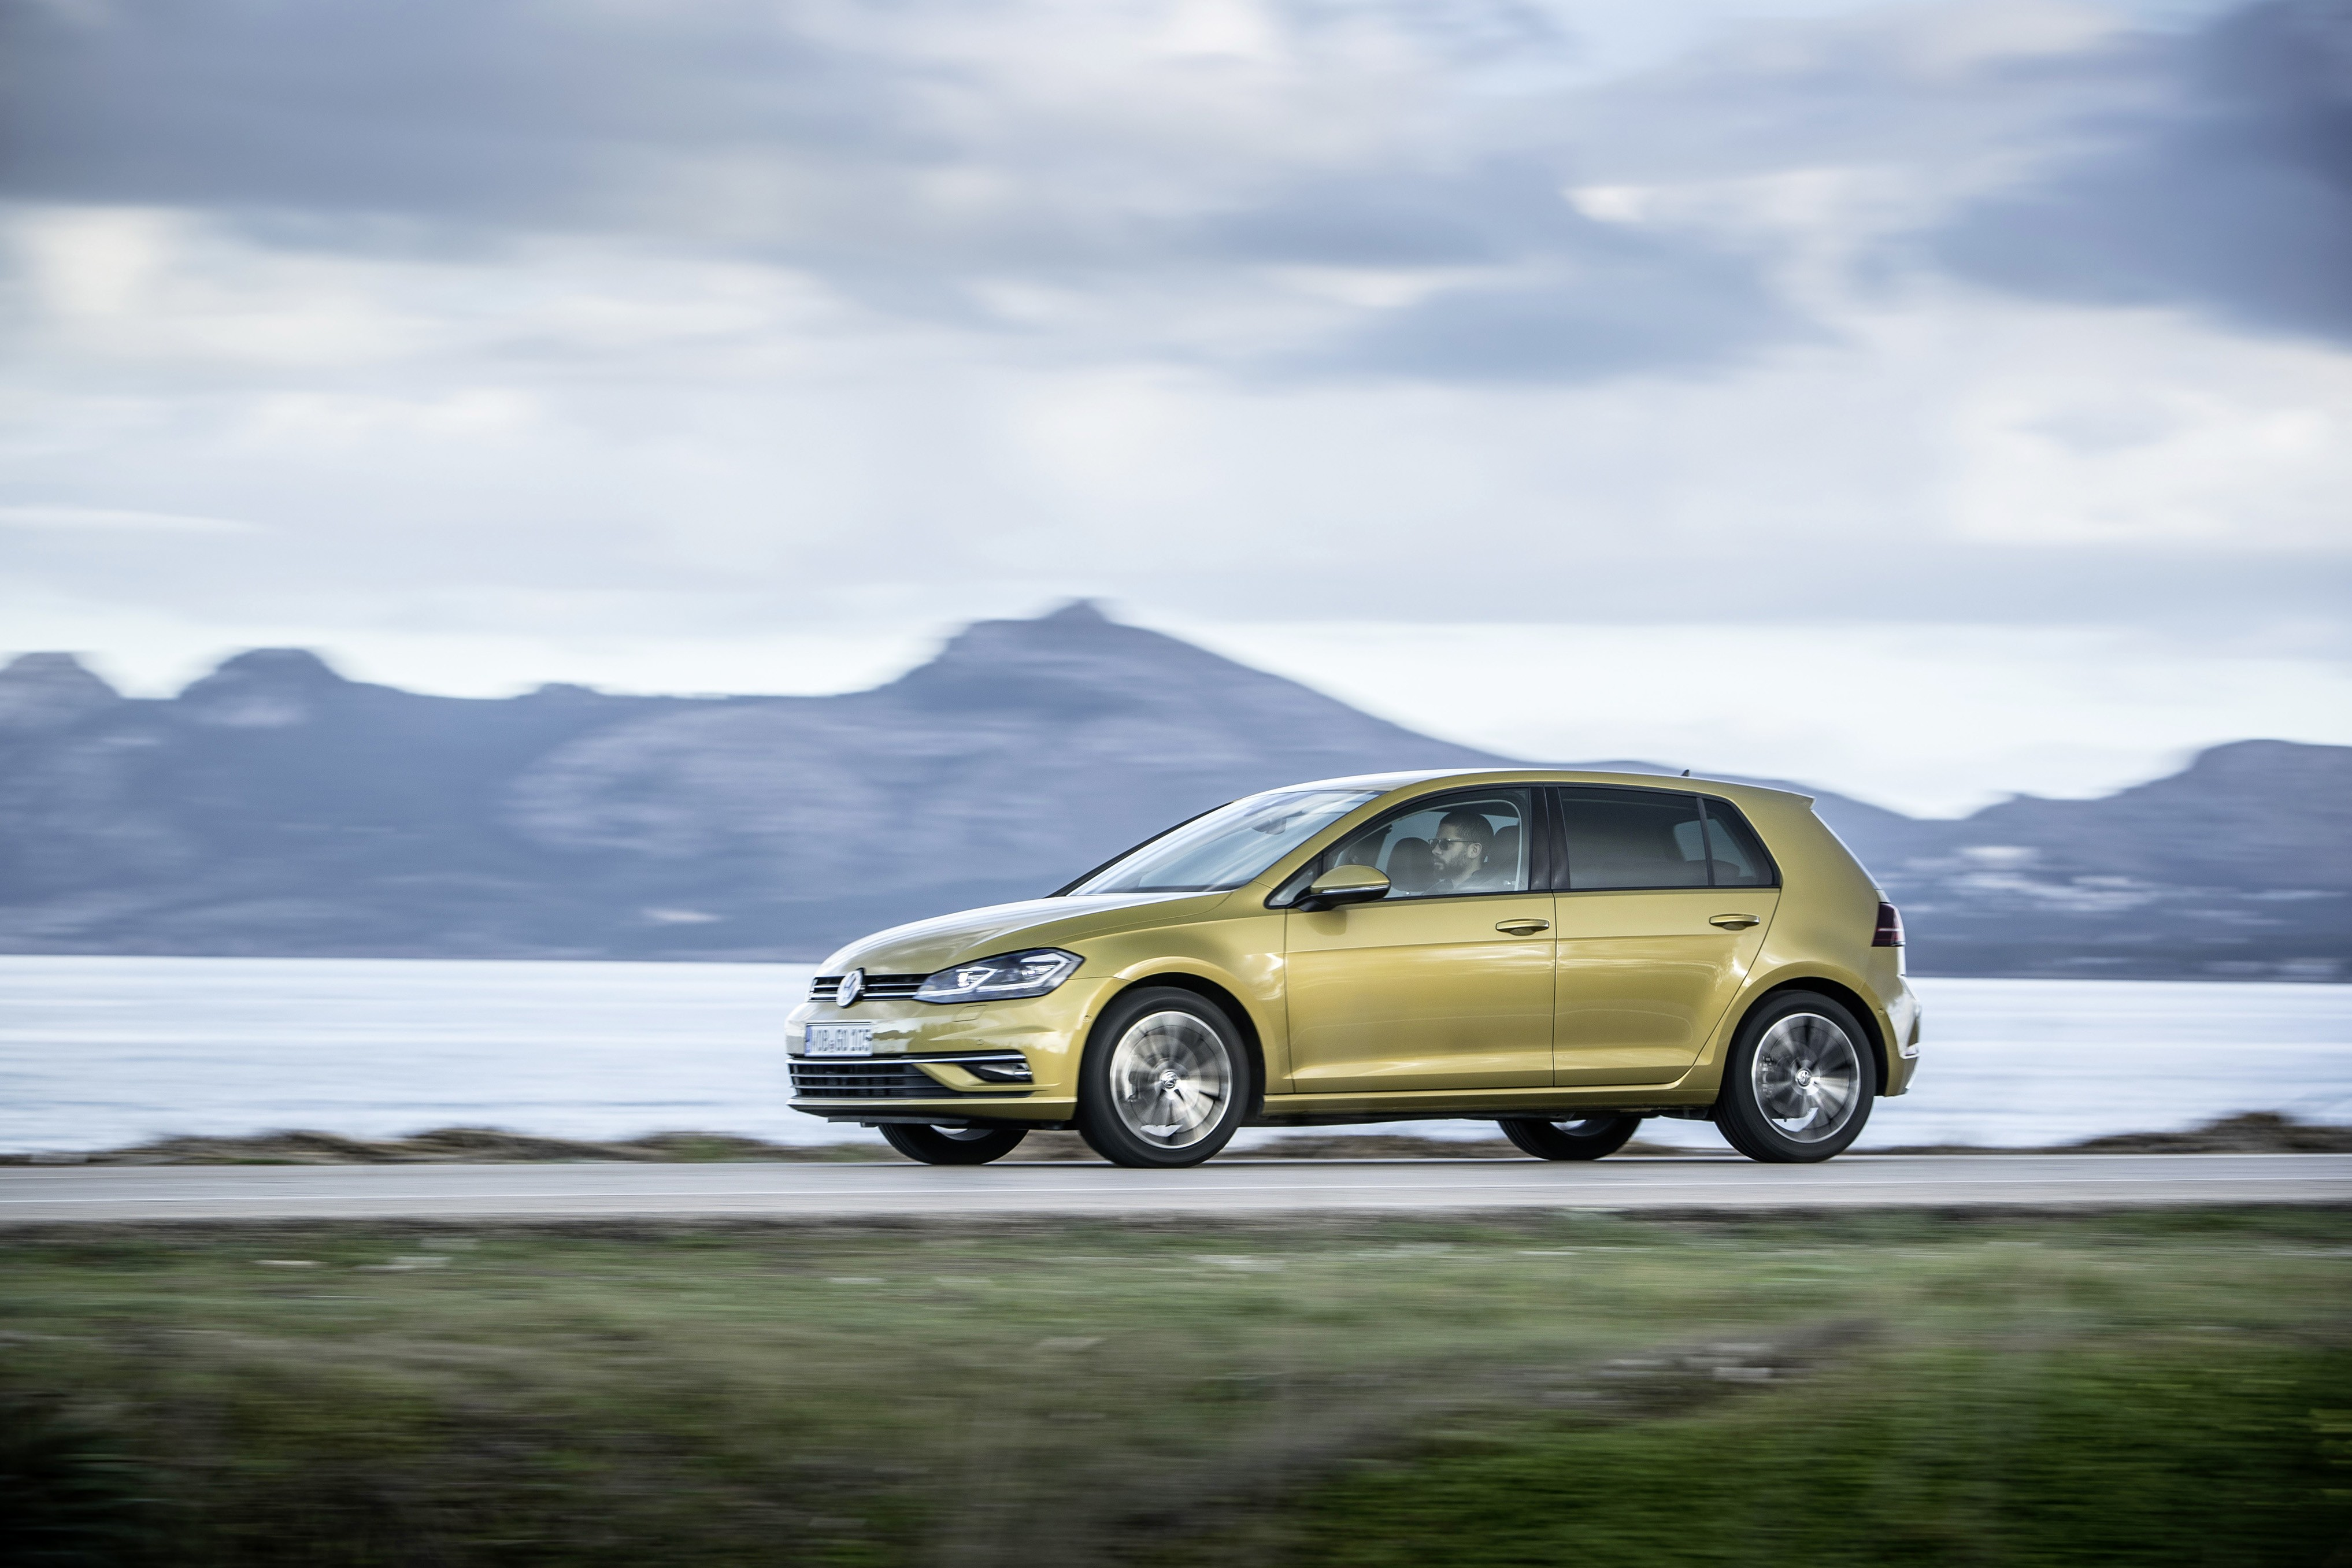 2017 Volkswagen Golf 1 5 Tsi Evo Gets Specs Sheet